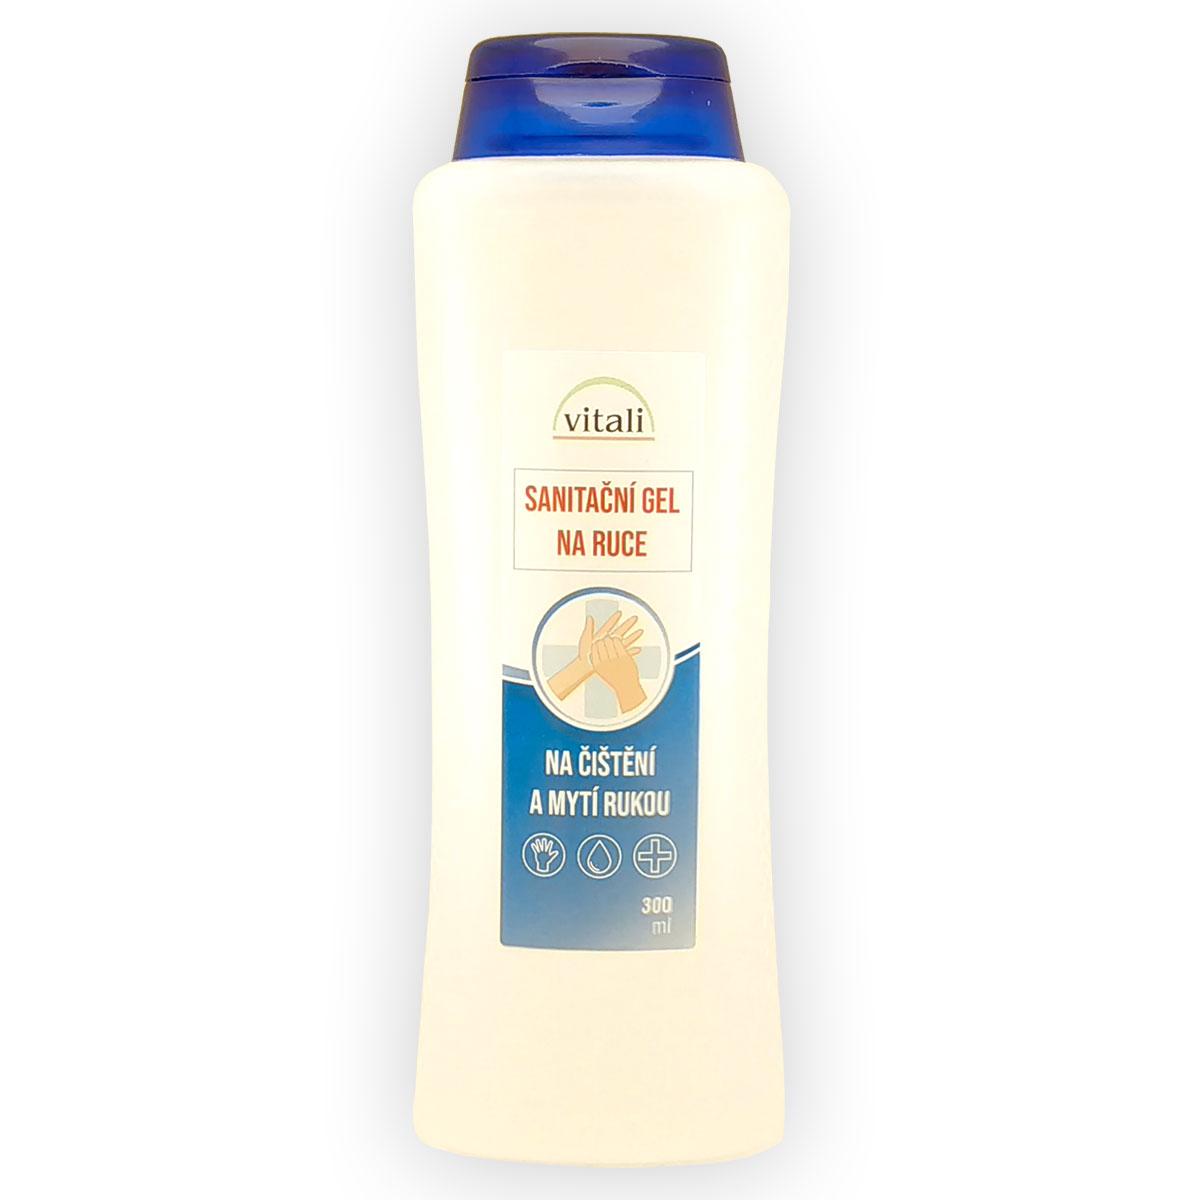 02173 Sanitační gel na ruce 300ml